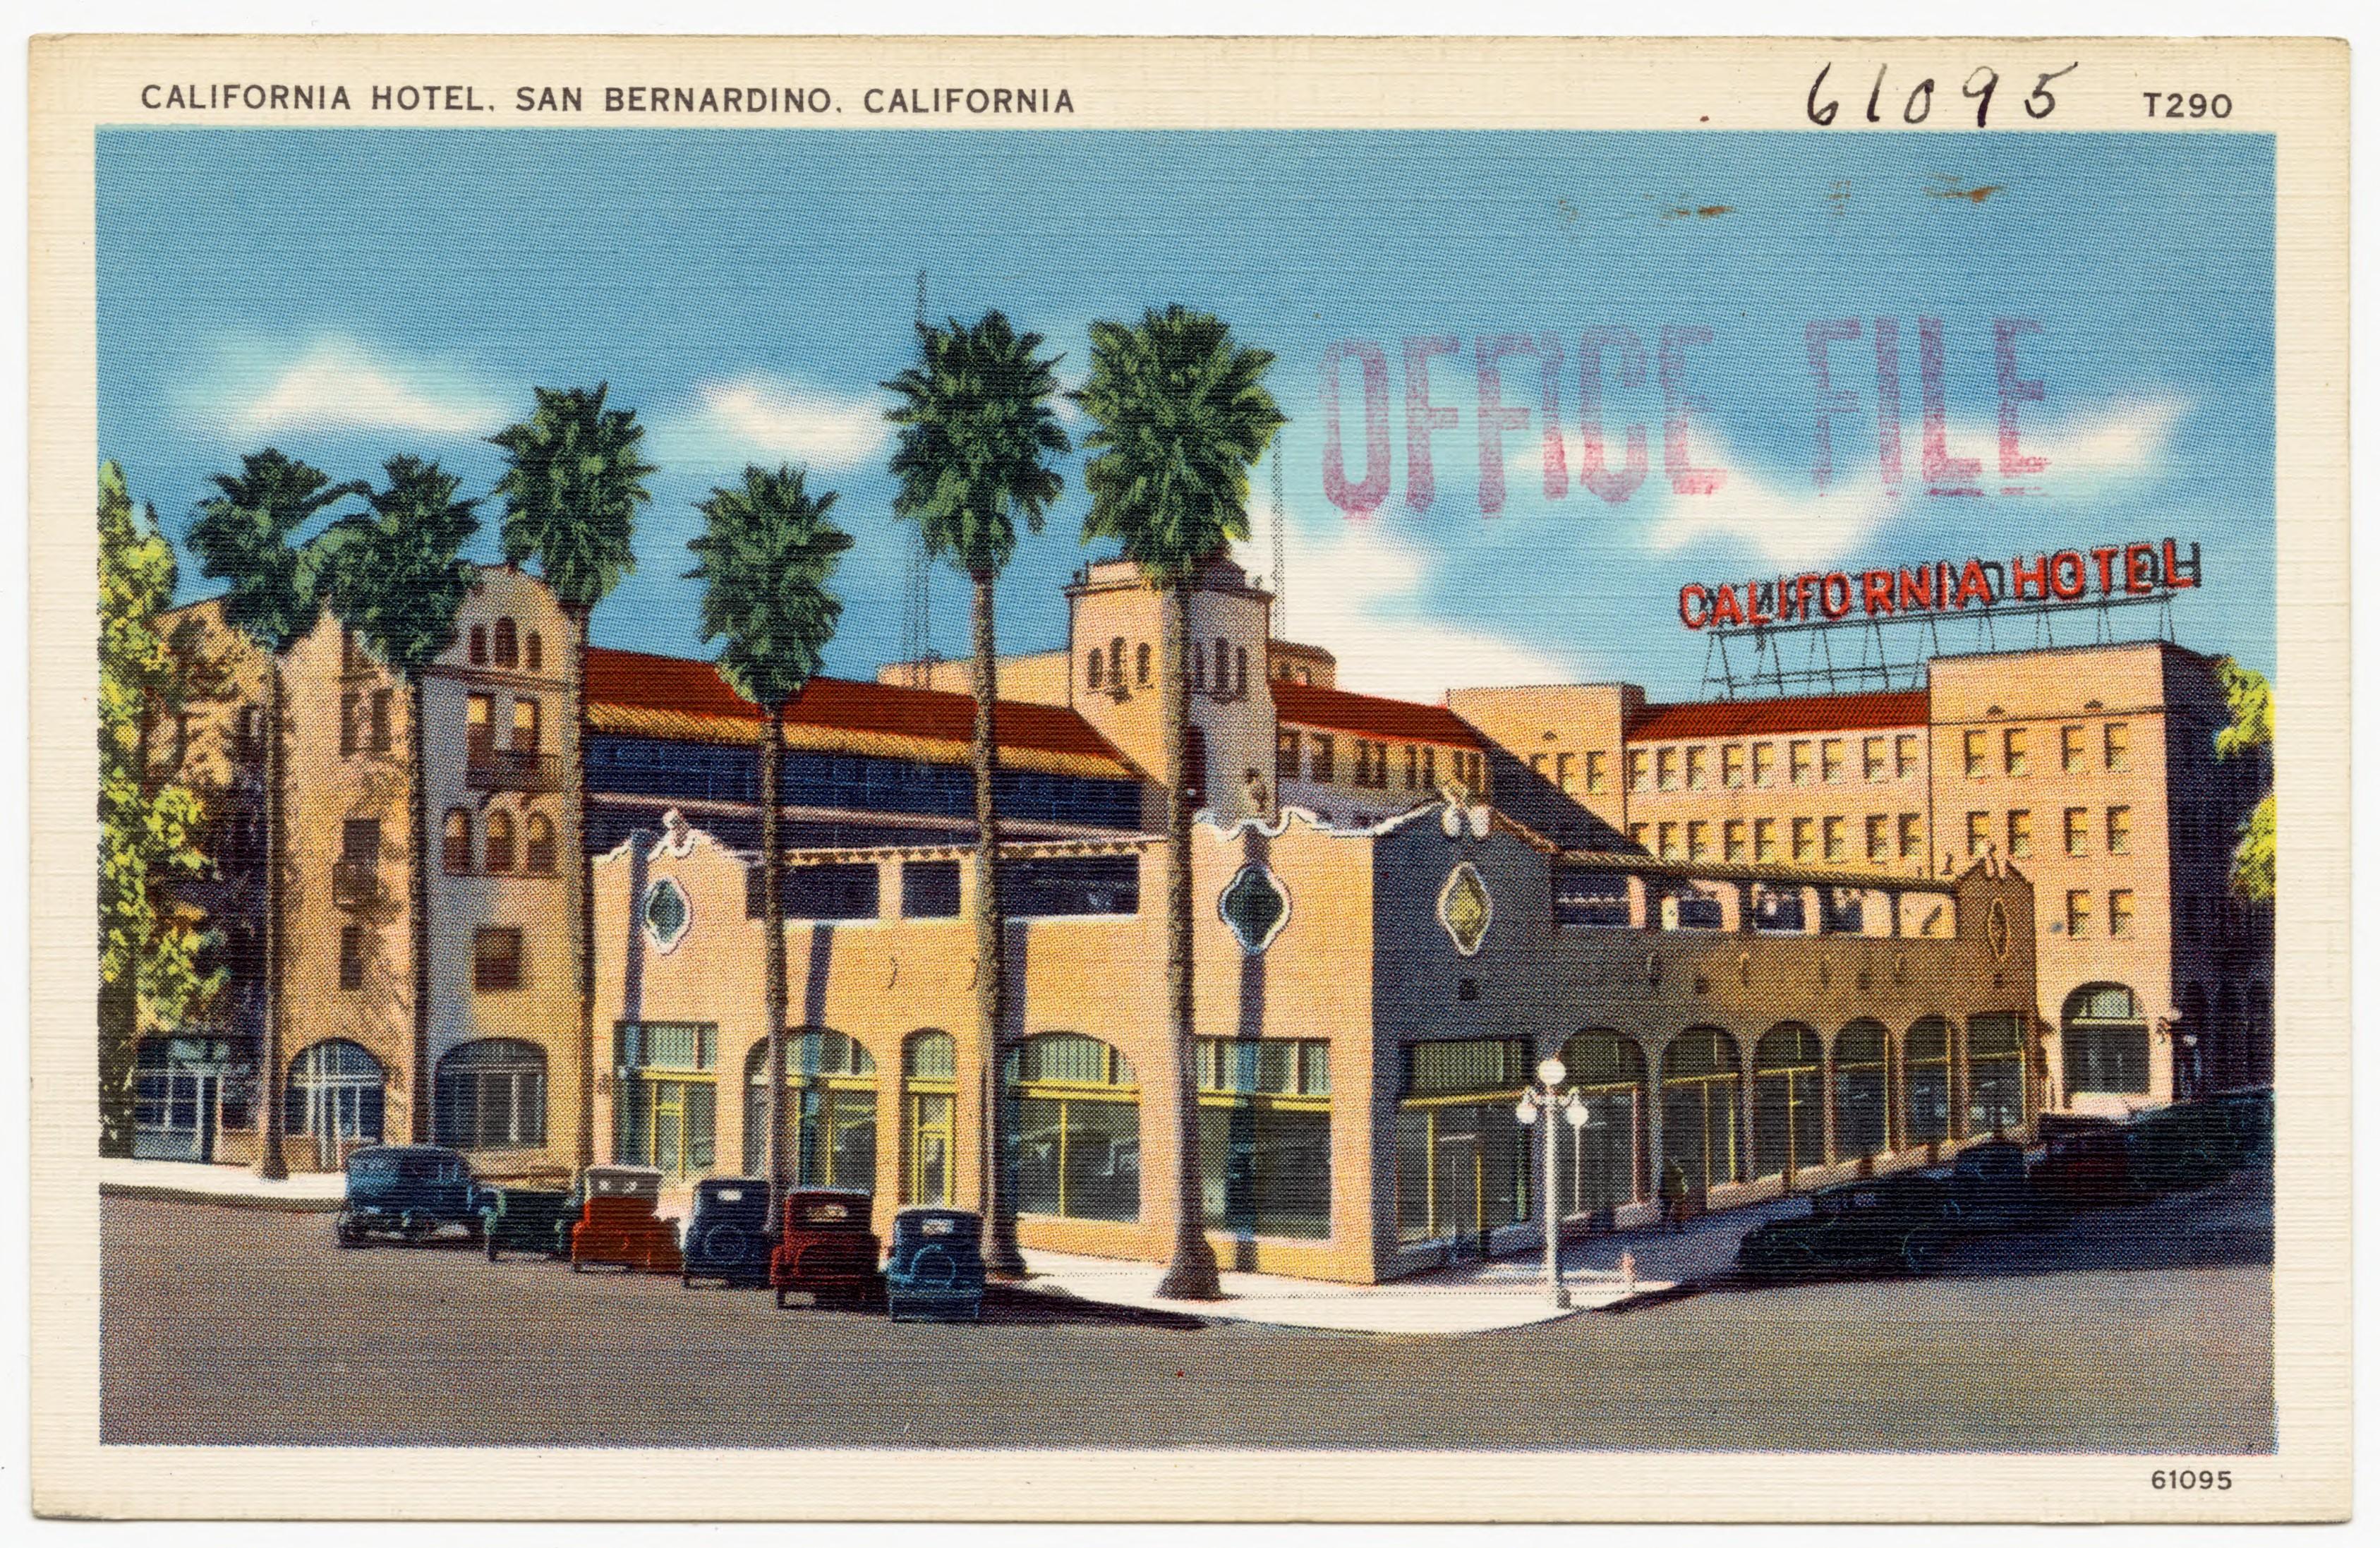 FileCalifornia Hotel San Bernardino California 61095